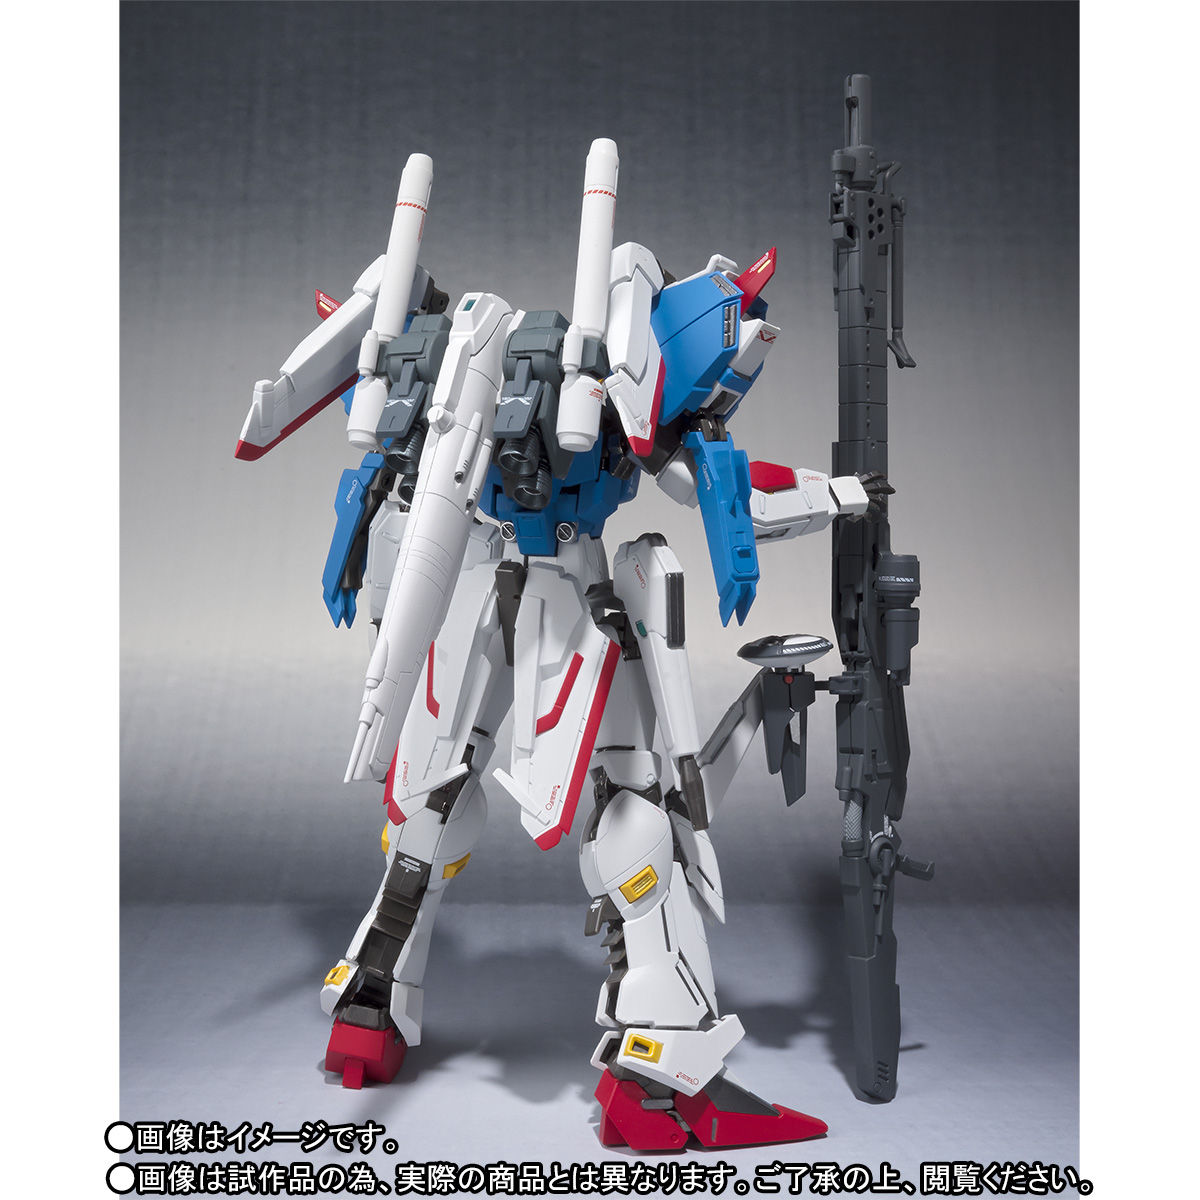 METAL ROBOT魂(Ka signature)〈SIDE MS〉『Sガンダム』可動フィギュア-006